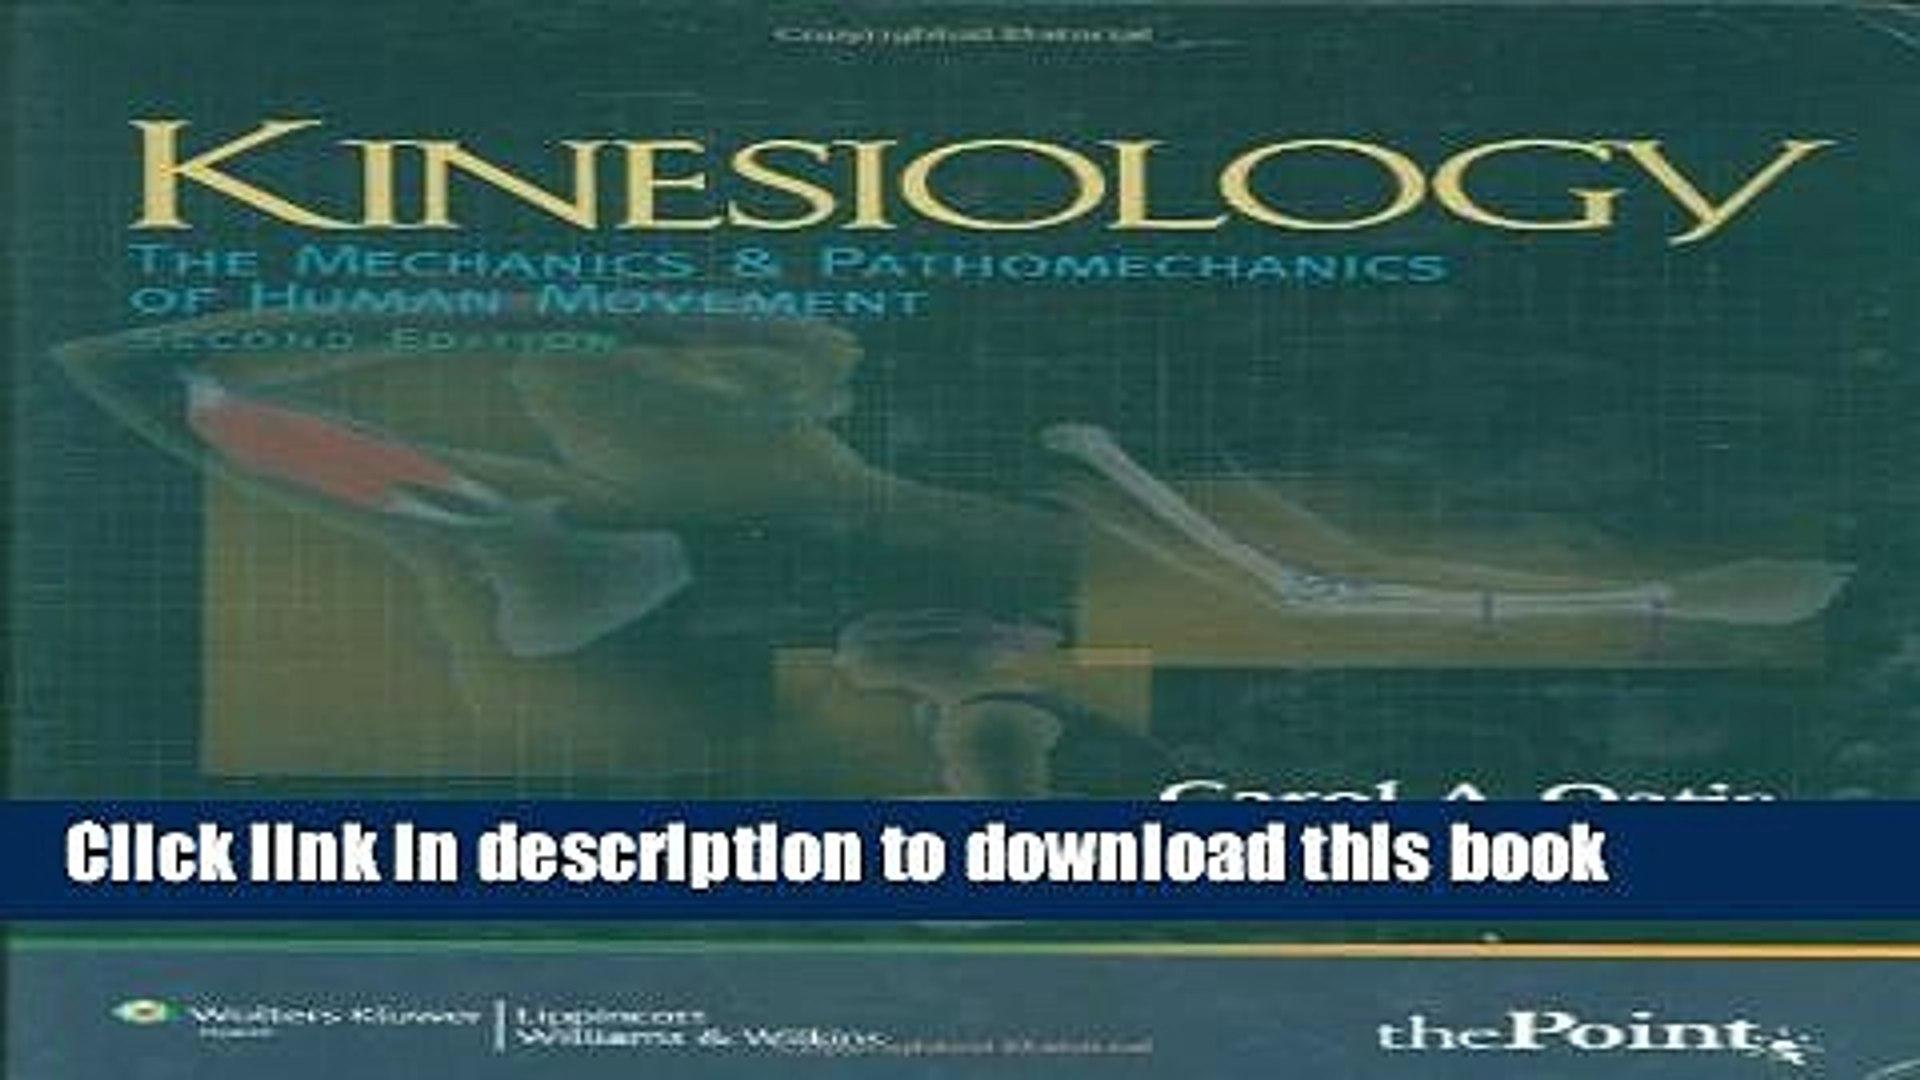 Download] Kinesiology The Mechanics and Pathomechanics of Human 1920x1080